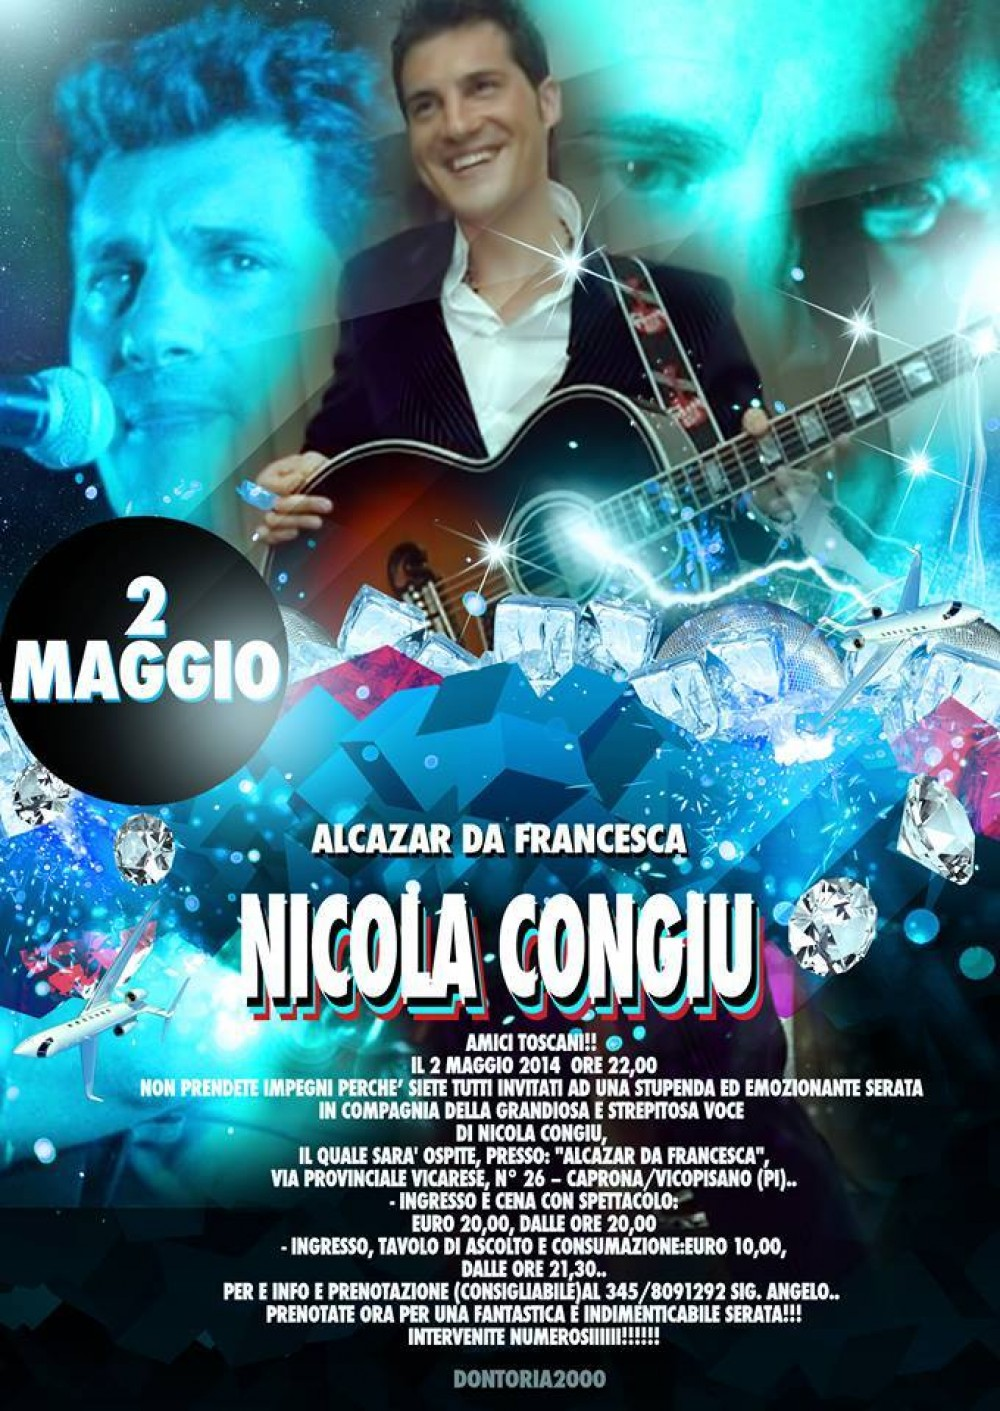 cropped-Nicola-Congiu-in-Toscana-02.05.14.jpg